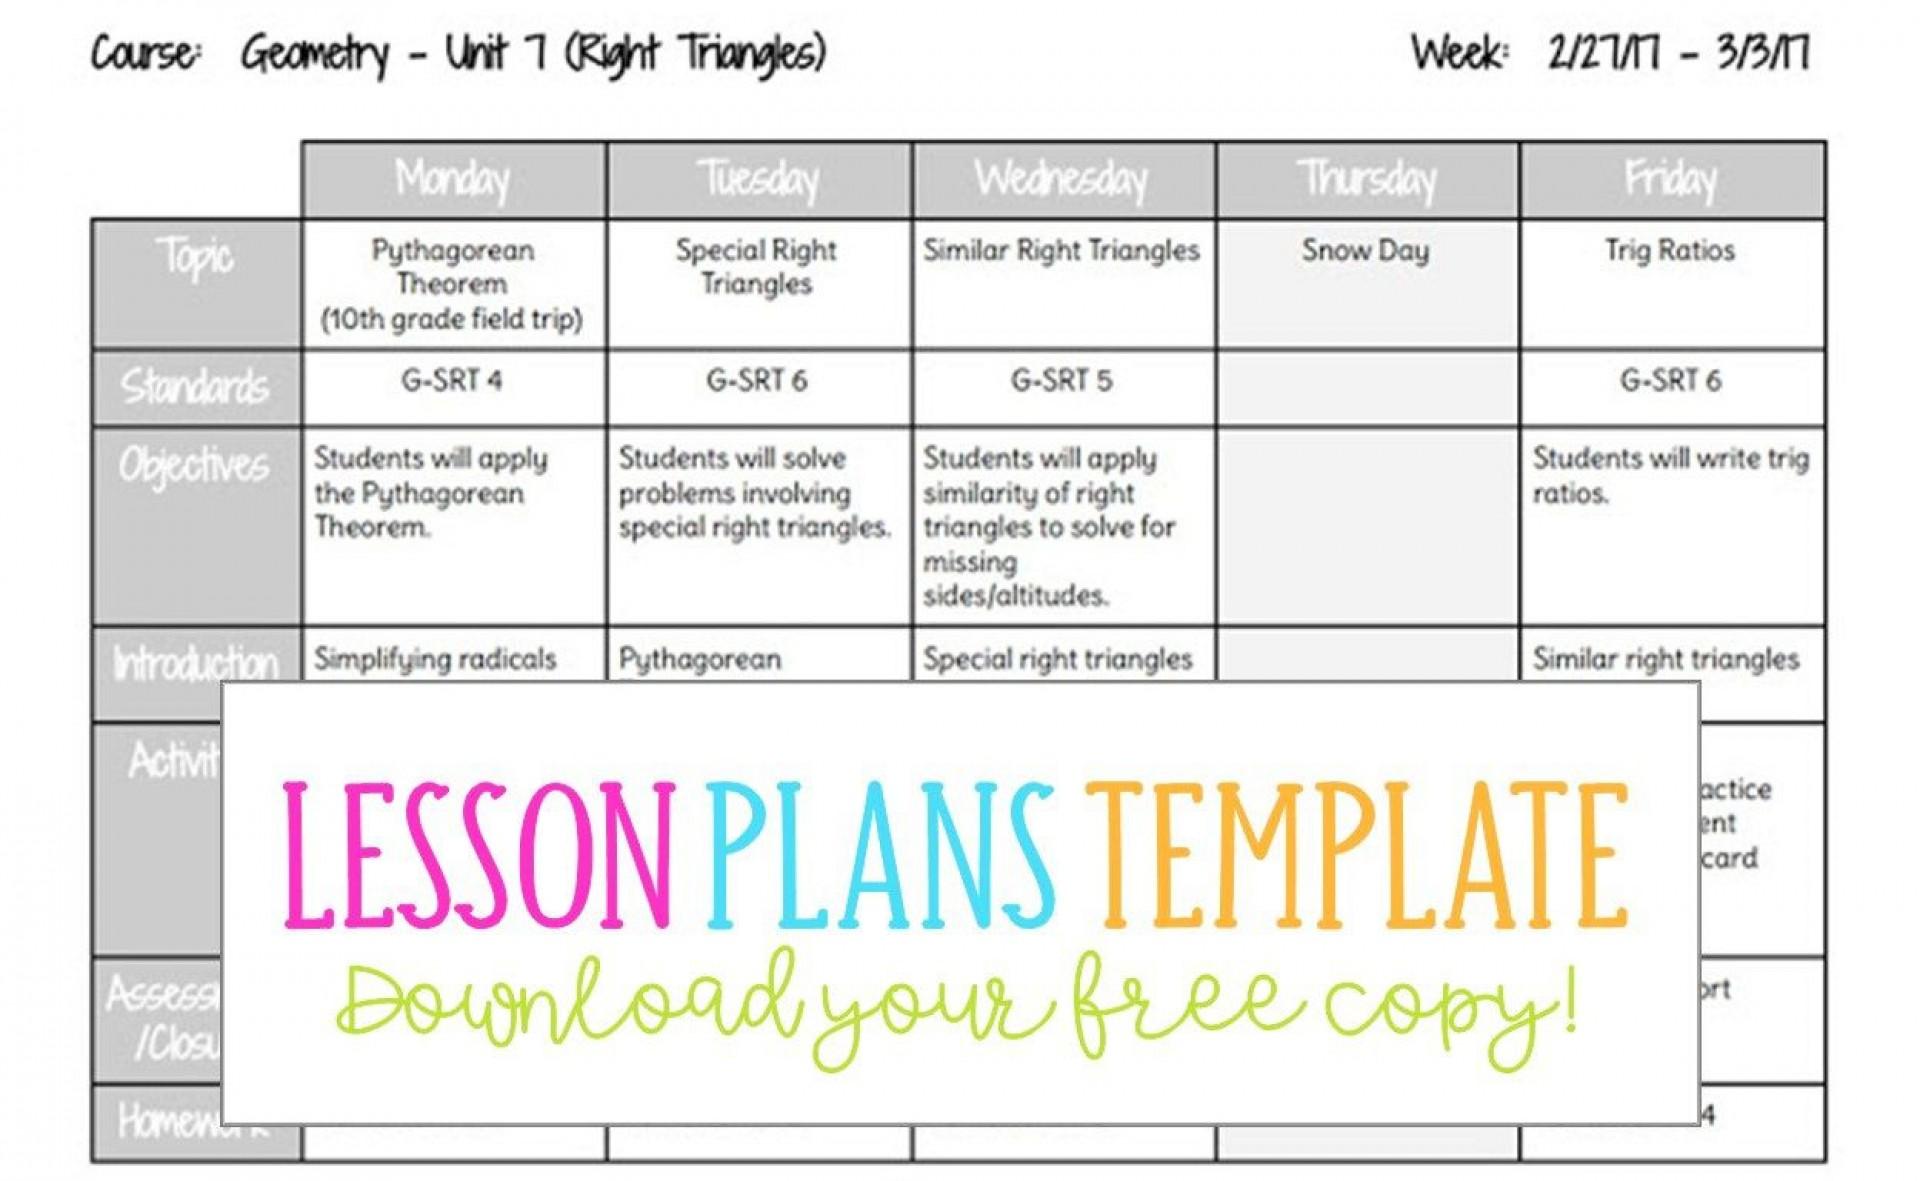 002 Singular Weekly Lesson Plan Template Editable High Def  Google Doc Preschool Downloadable Free1920